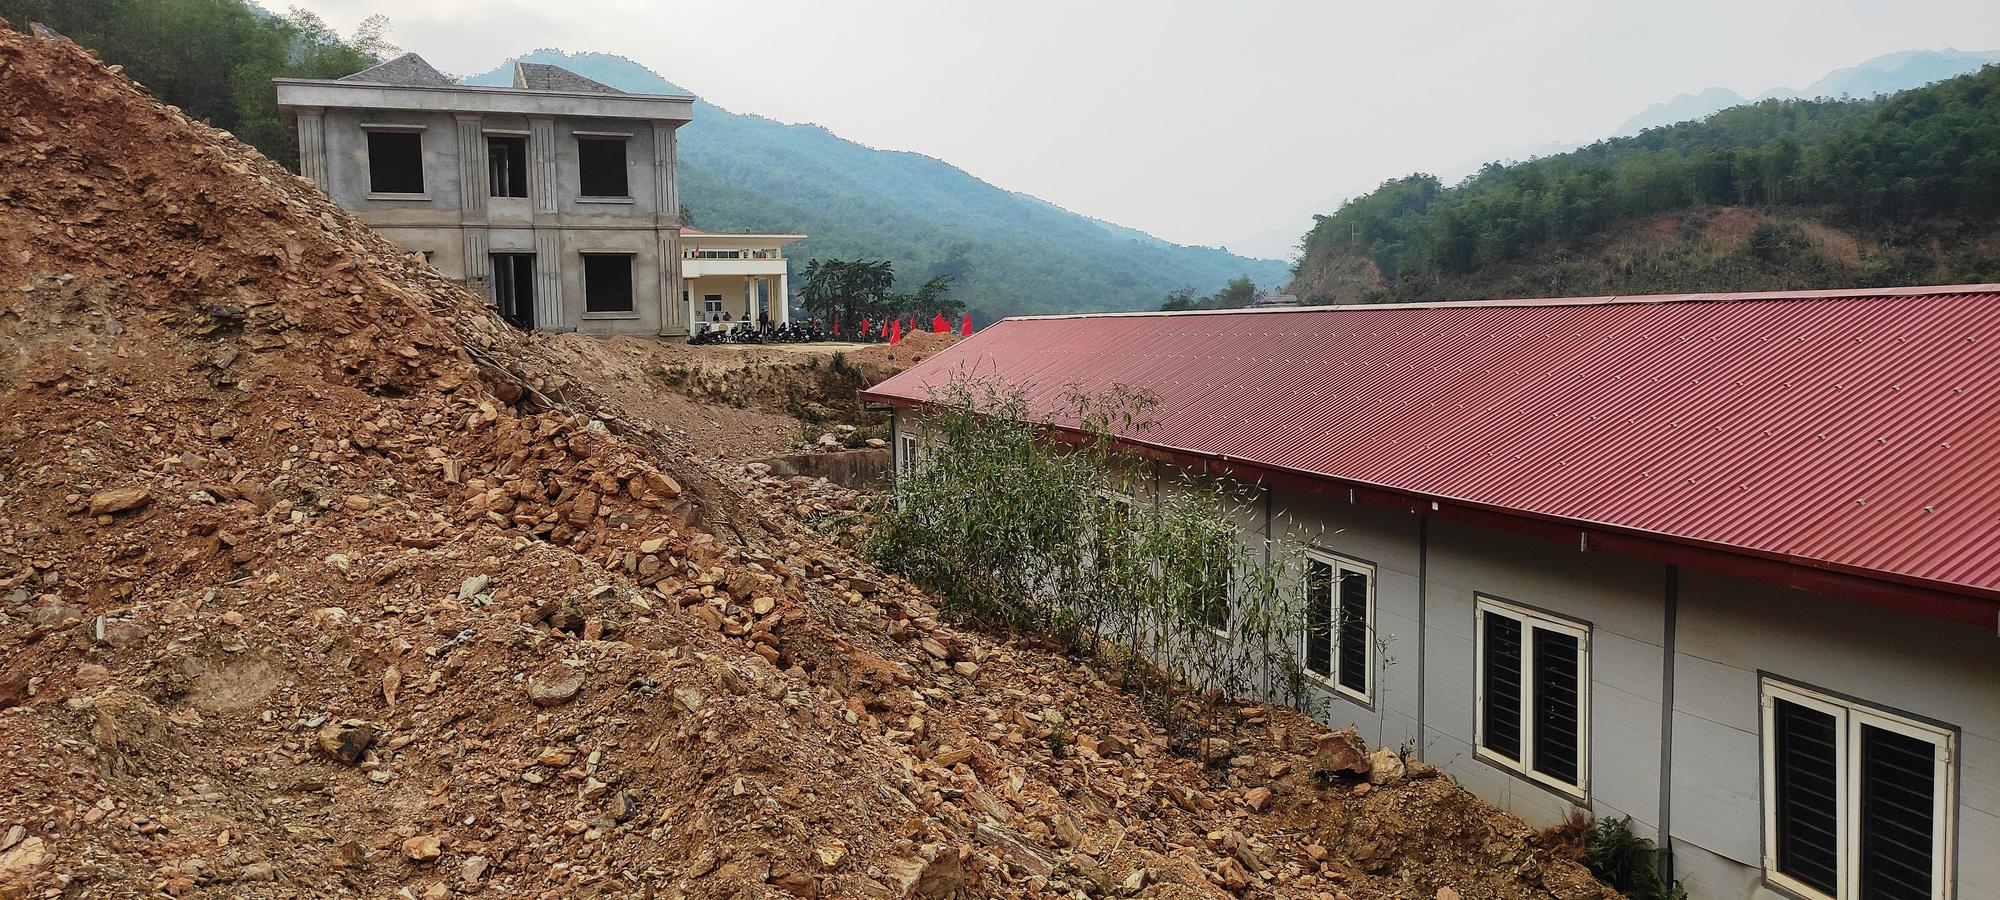 North-central Vietnamese province relocates graveyard to handle landslide